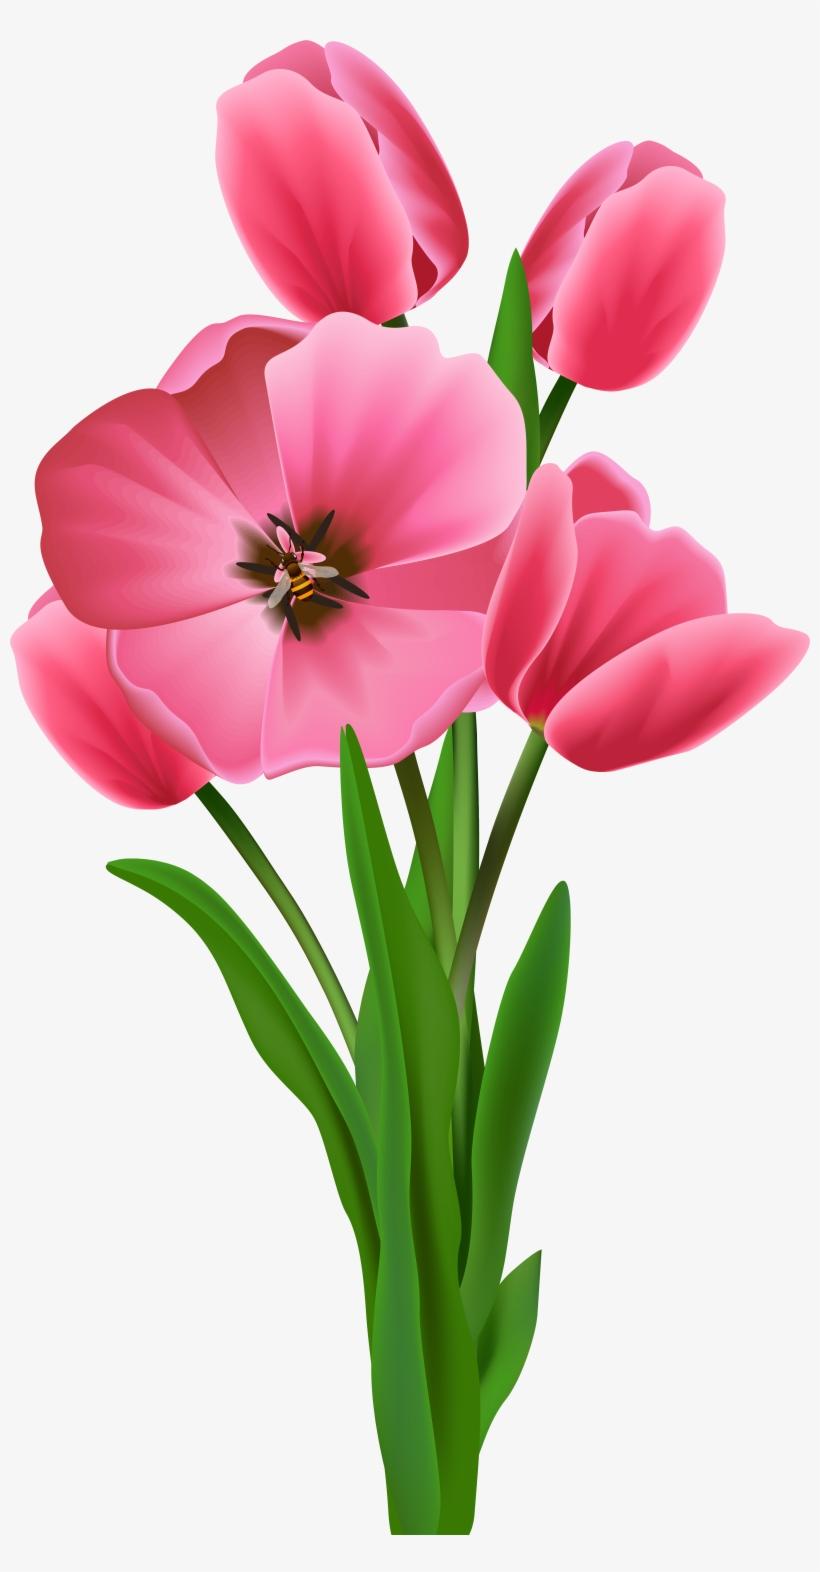 Transparent Image Tulipany Pinterest - Tree Flower Clipart Png, transparent png #501752